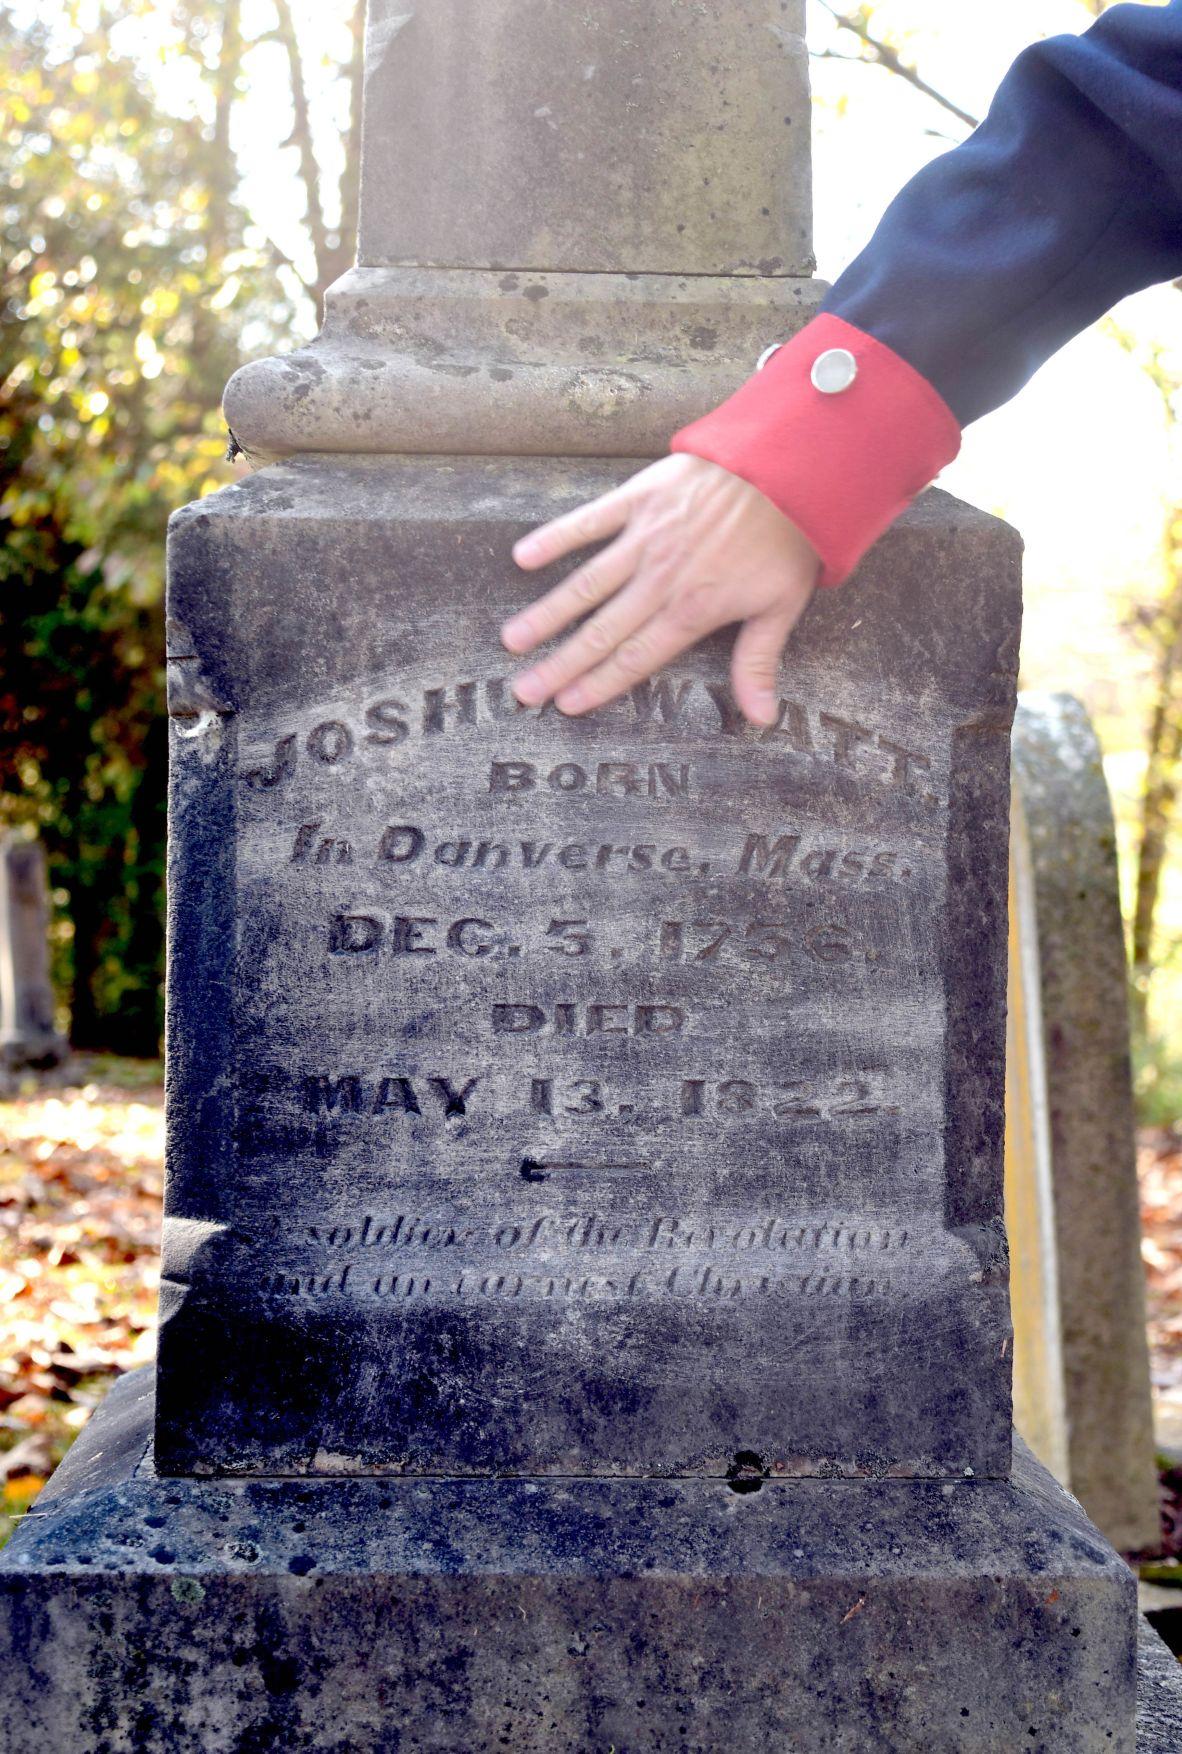 Josh wyatt grave